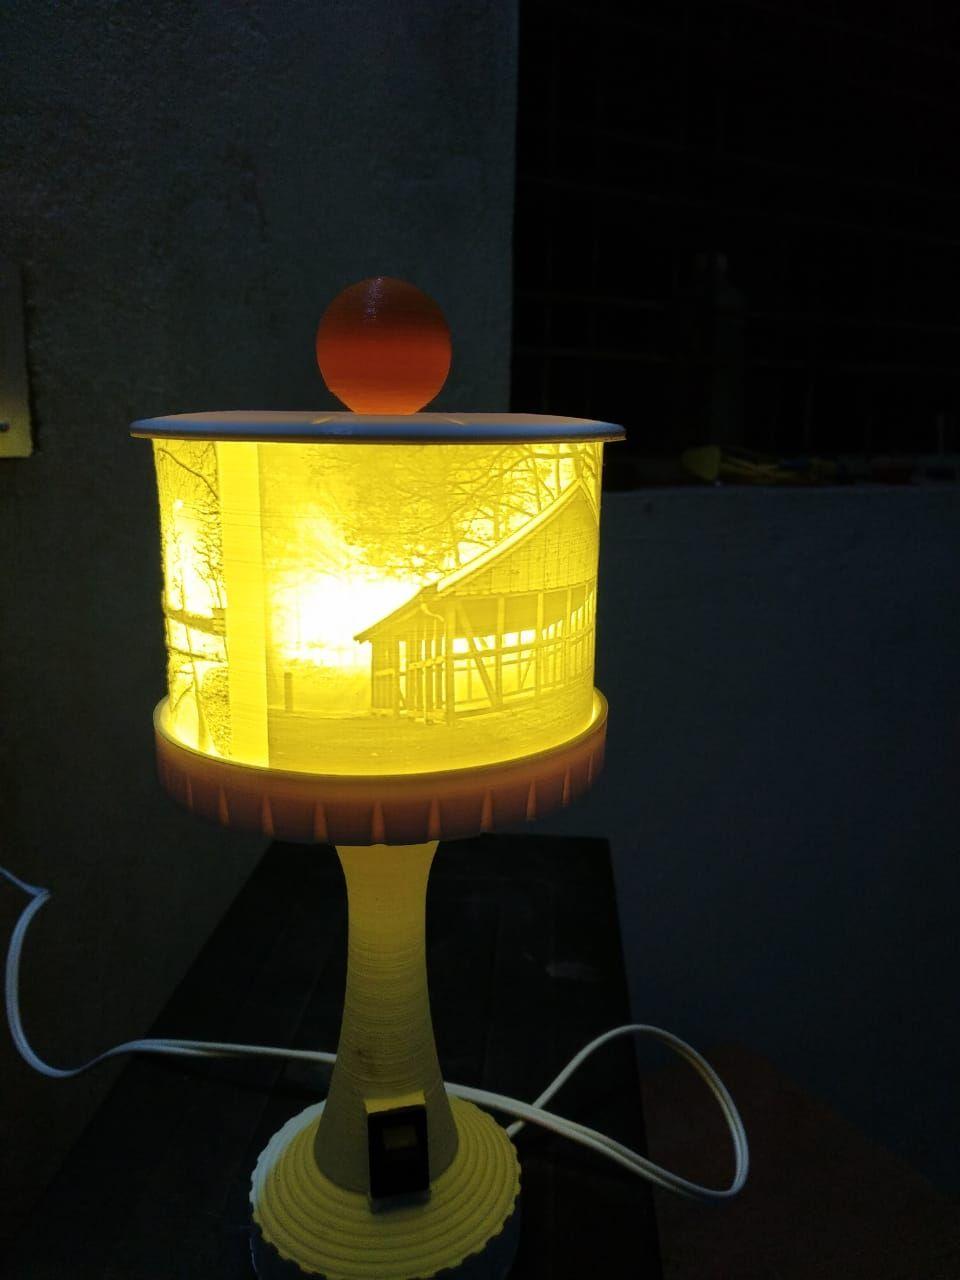 Lithophane Lamp Lamp Paper Lamp Novelty Lamp